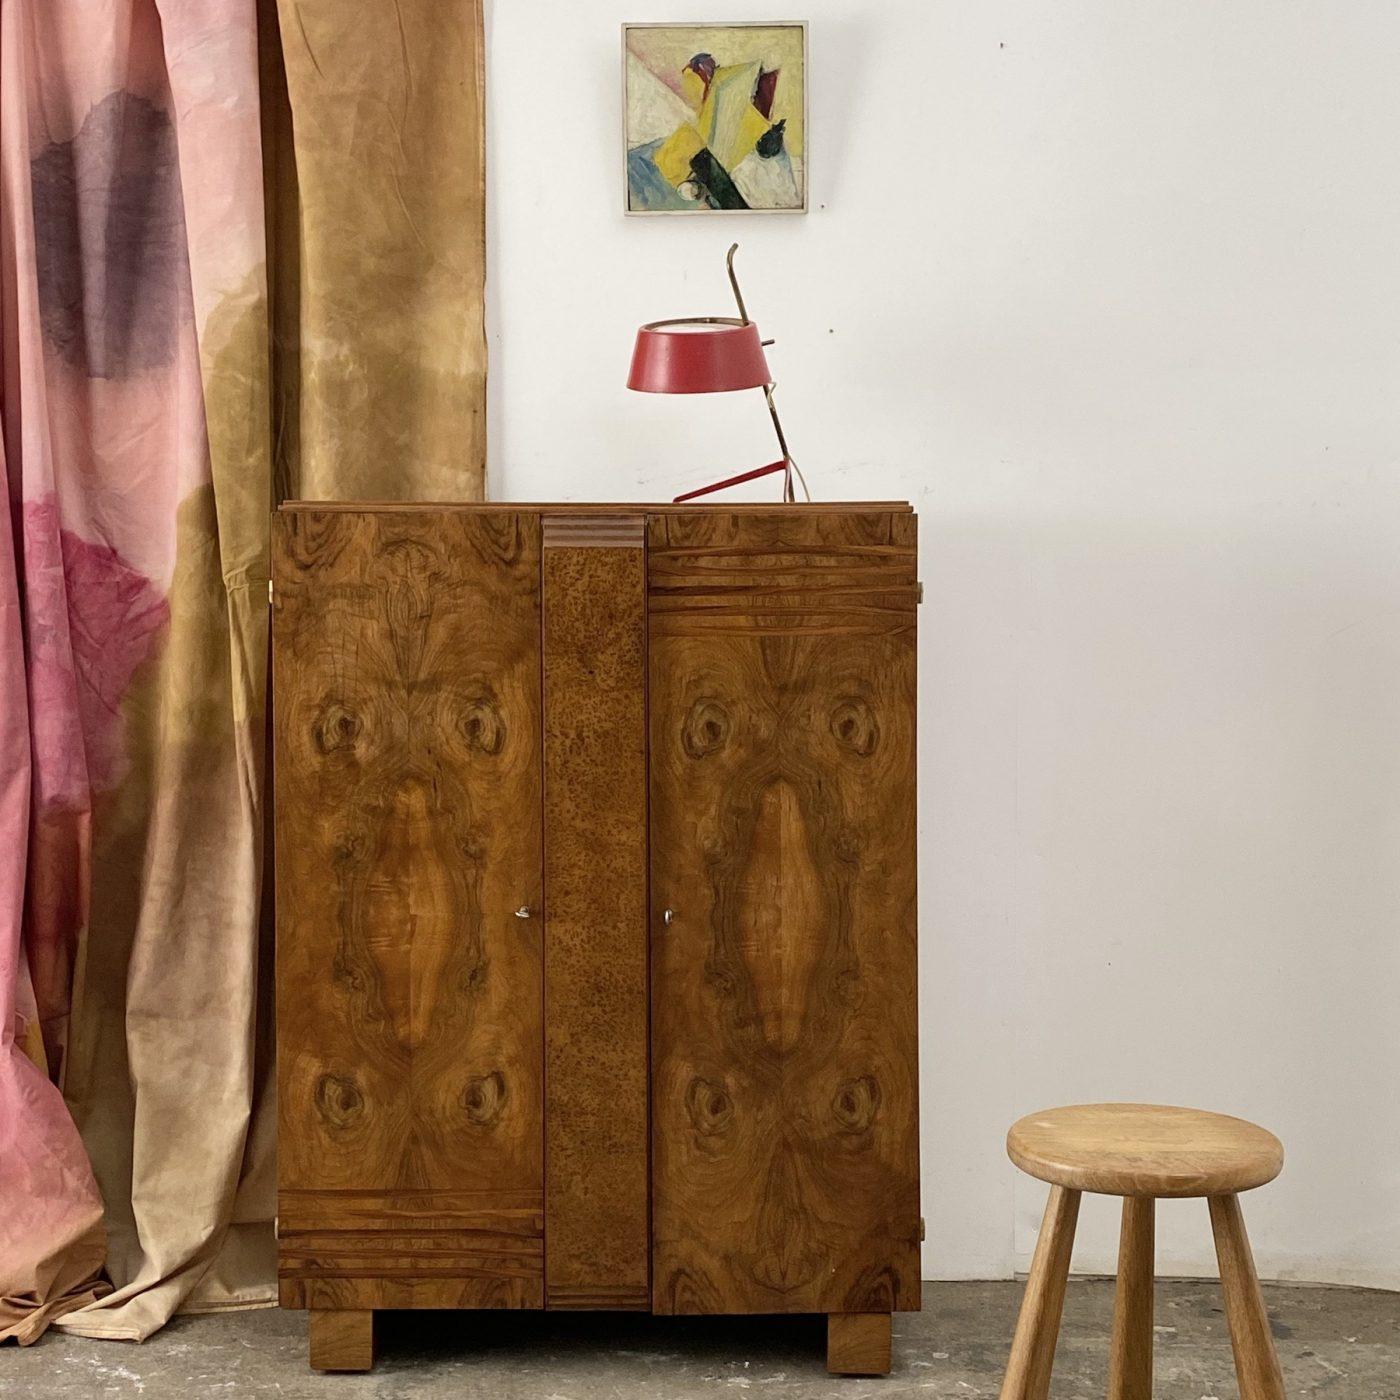 objet-vagabond-artdeco-cabinet0002